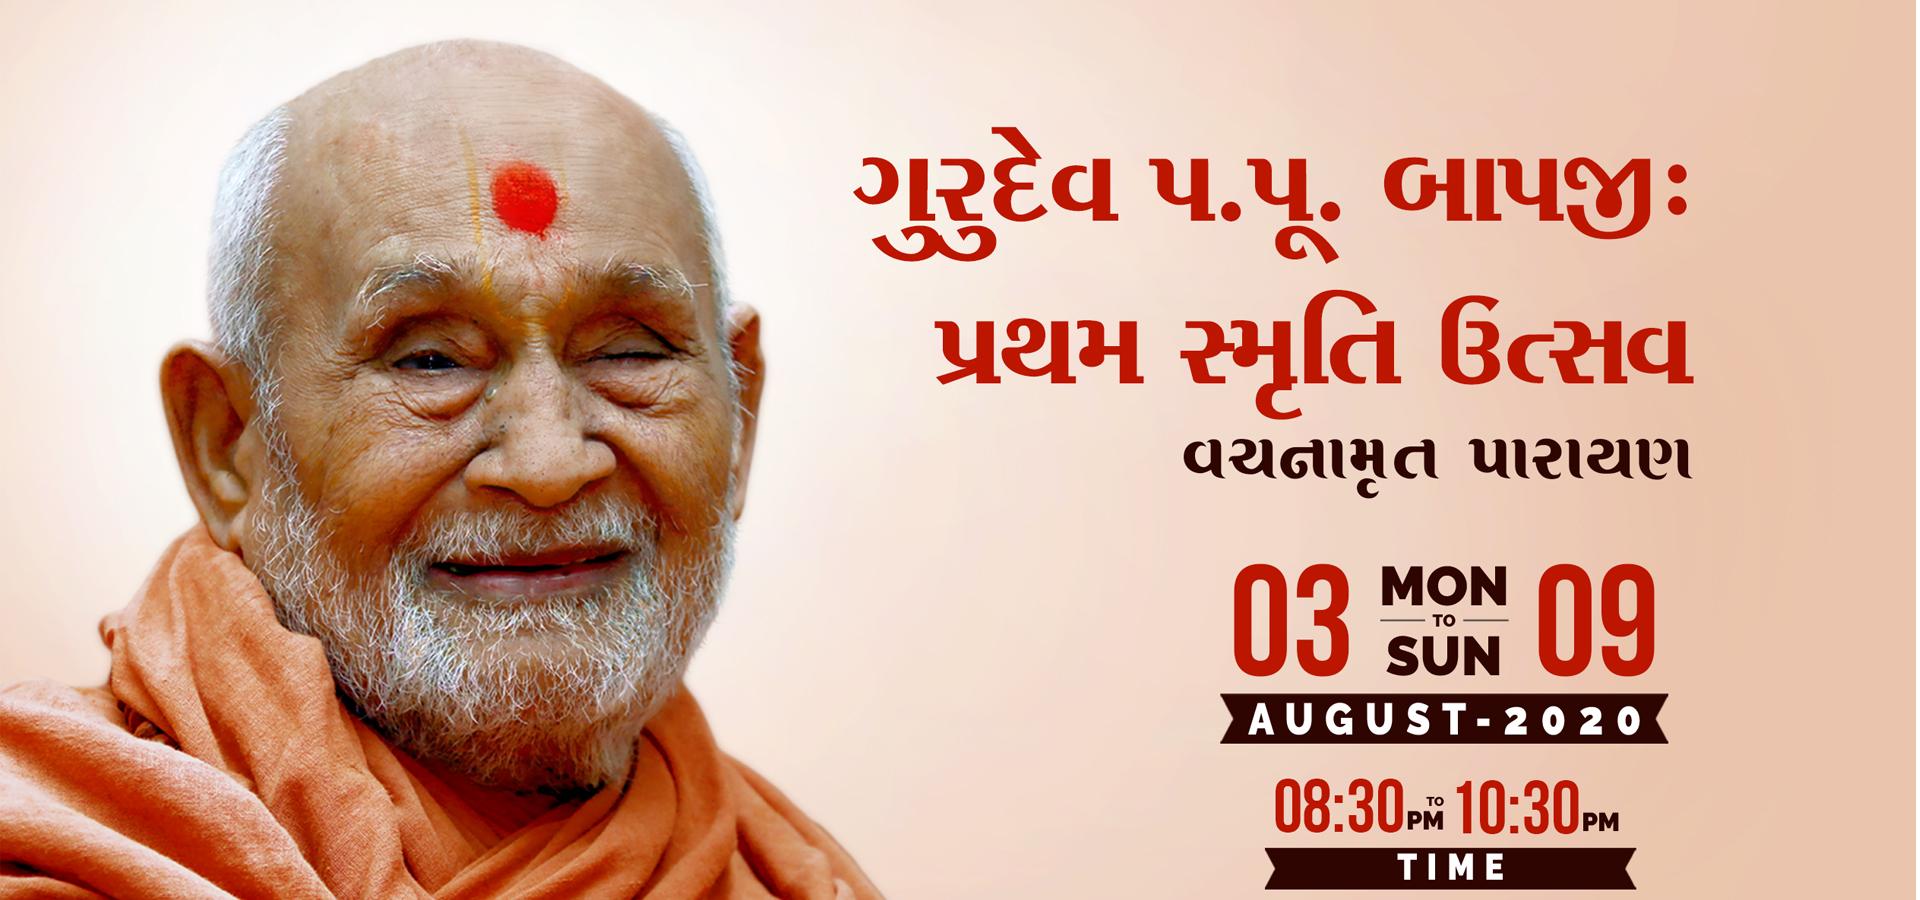 Gurudev HDH Bapji First Smruti Utsav